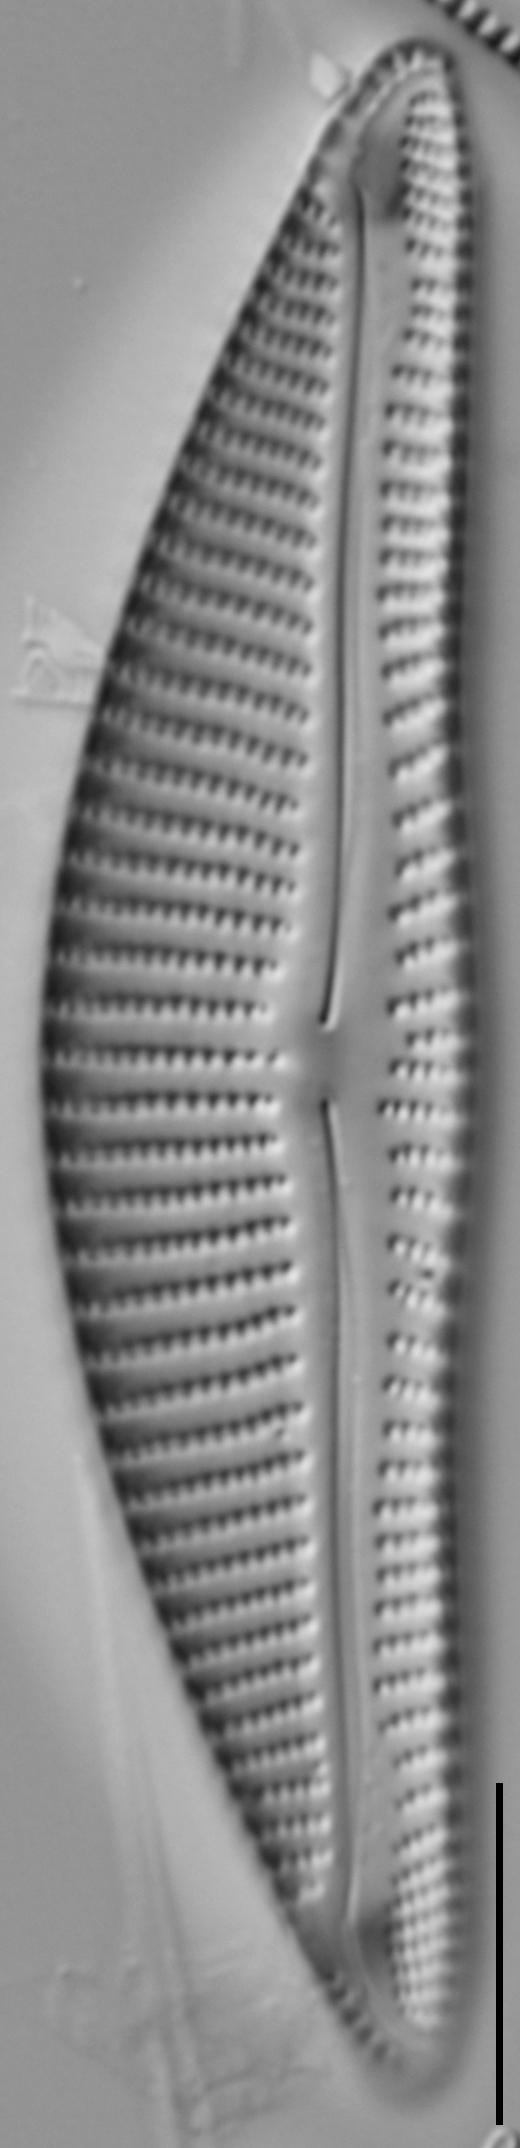 Encyonema minutum var pseudogracilis LM6